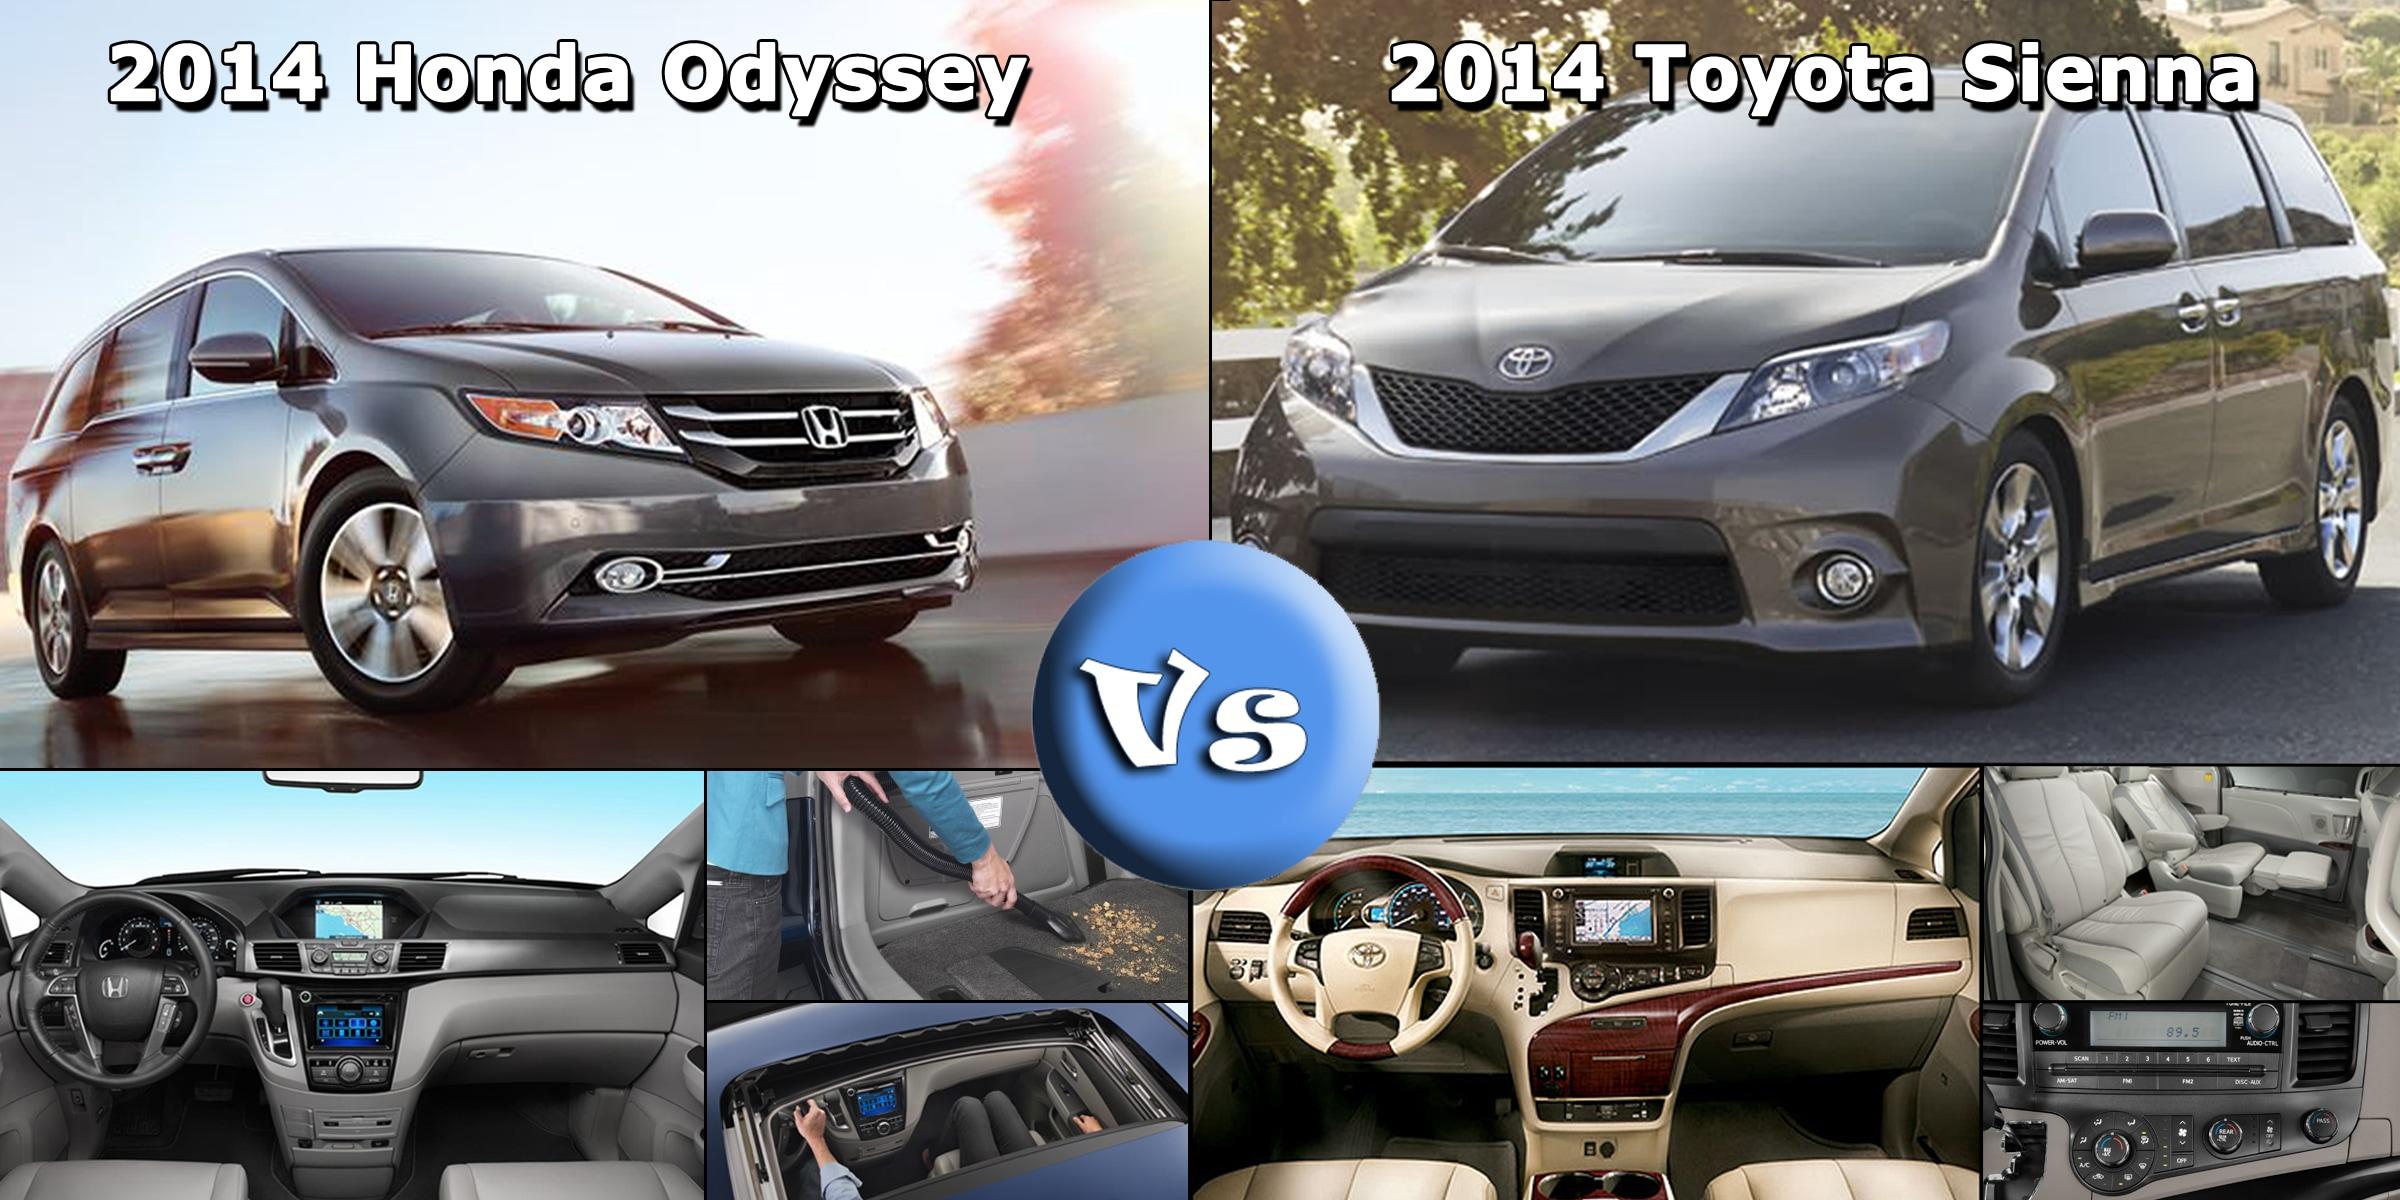 Minivan comparison 2014 honda odyssey vs 2014 toyota sienna for Compare honda odyssey and toyota sienna